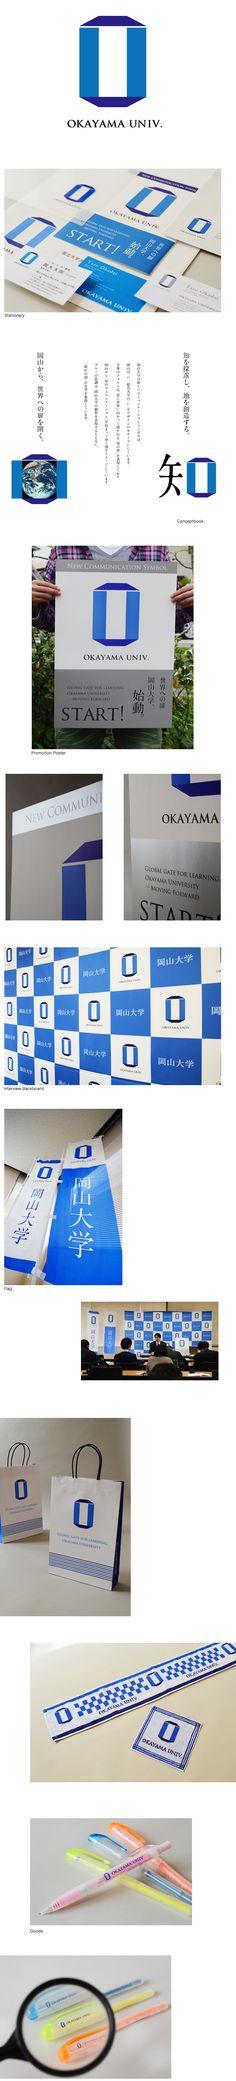 Visual identity system for OKAYAMA UNIV